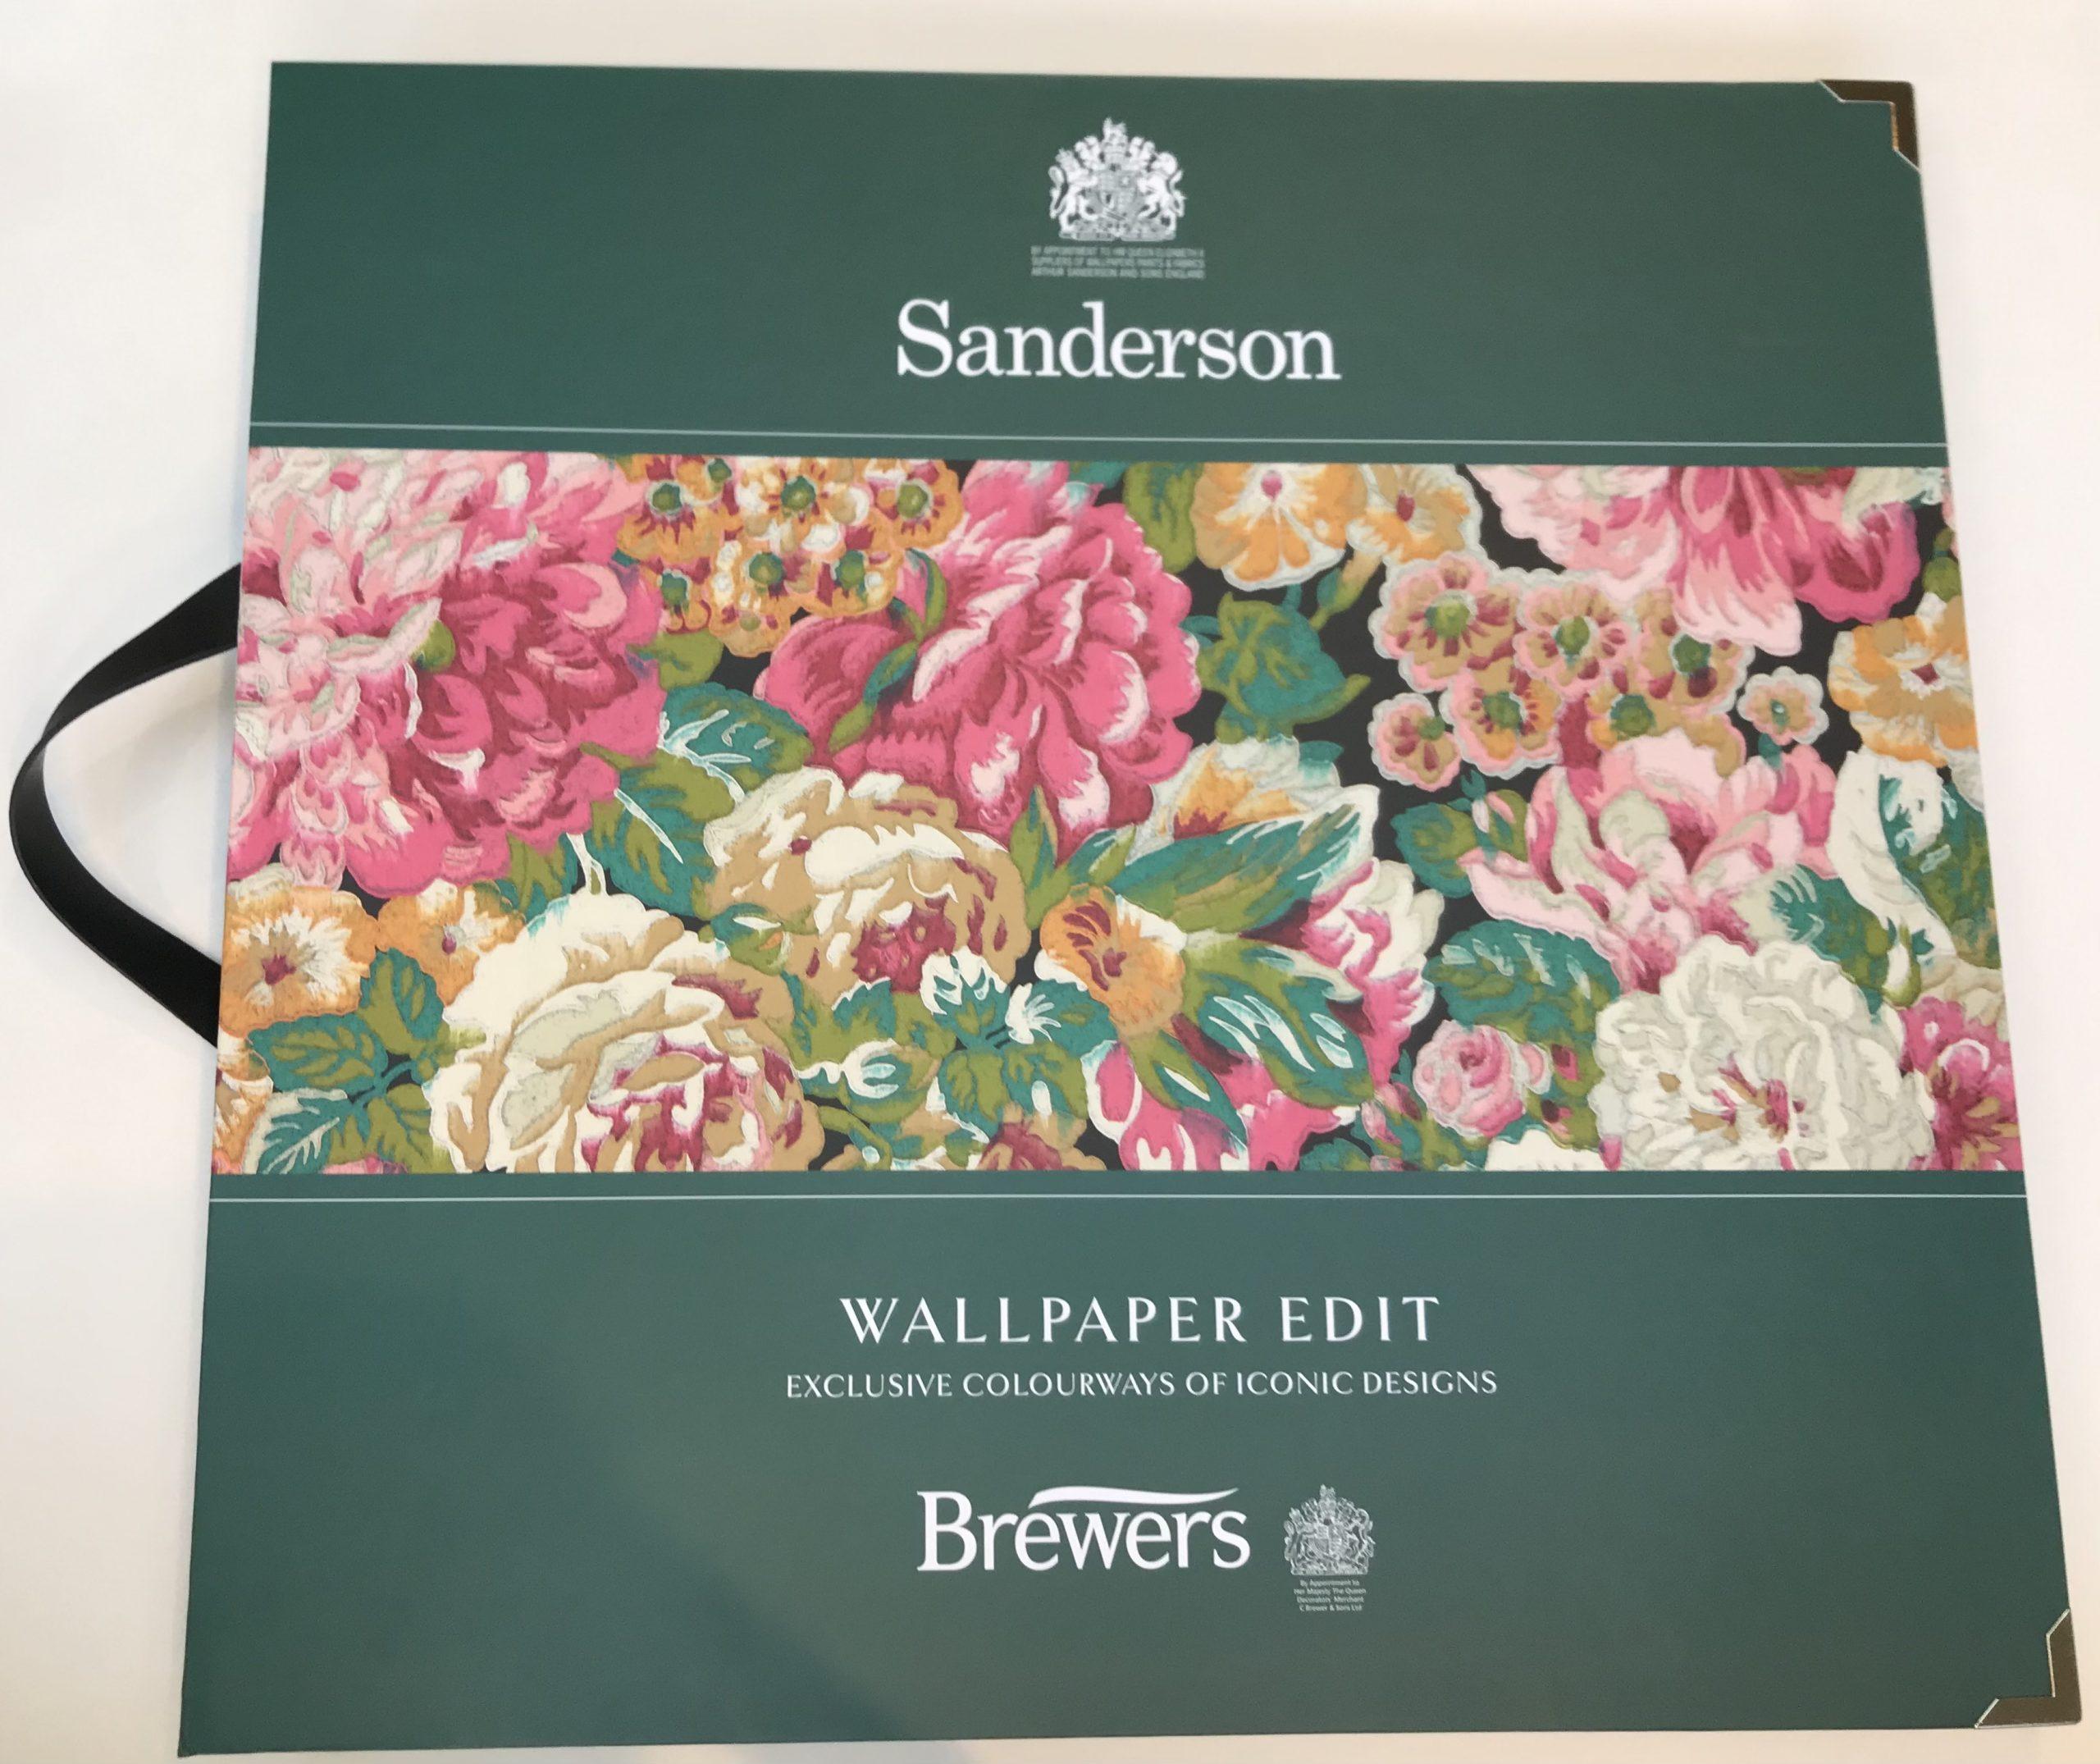 Wallpaper book club – Sanderson Wallpaper Edit